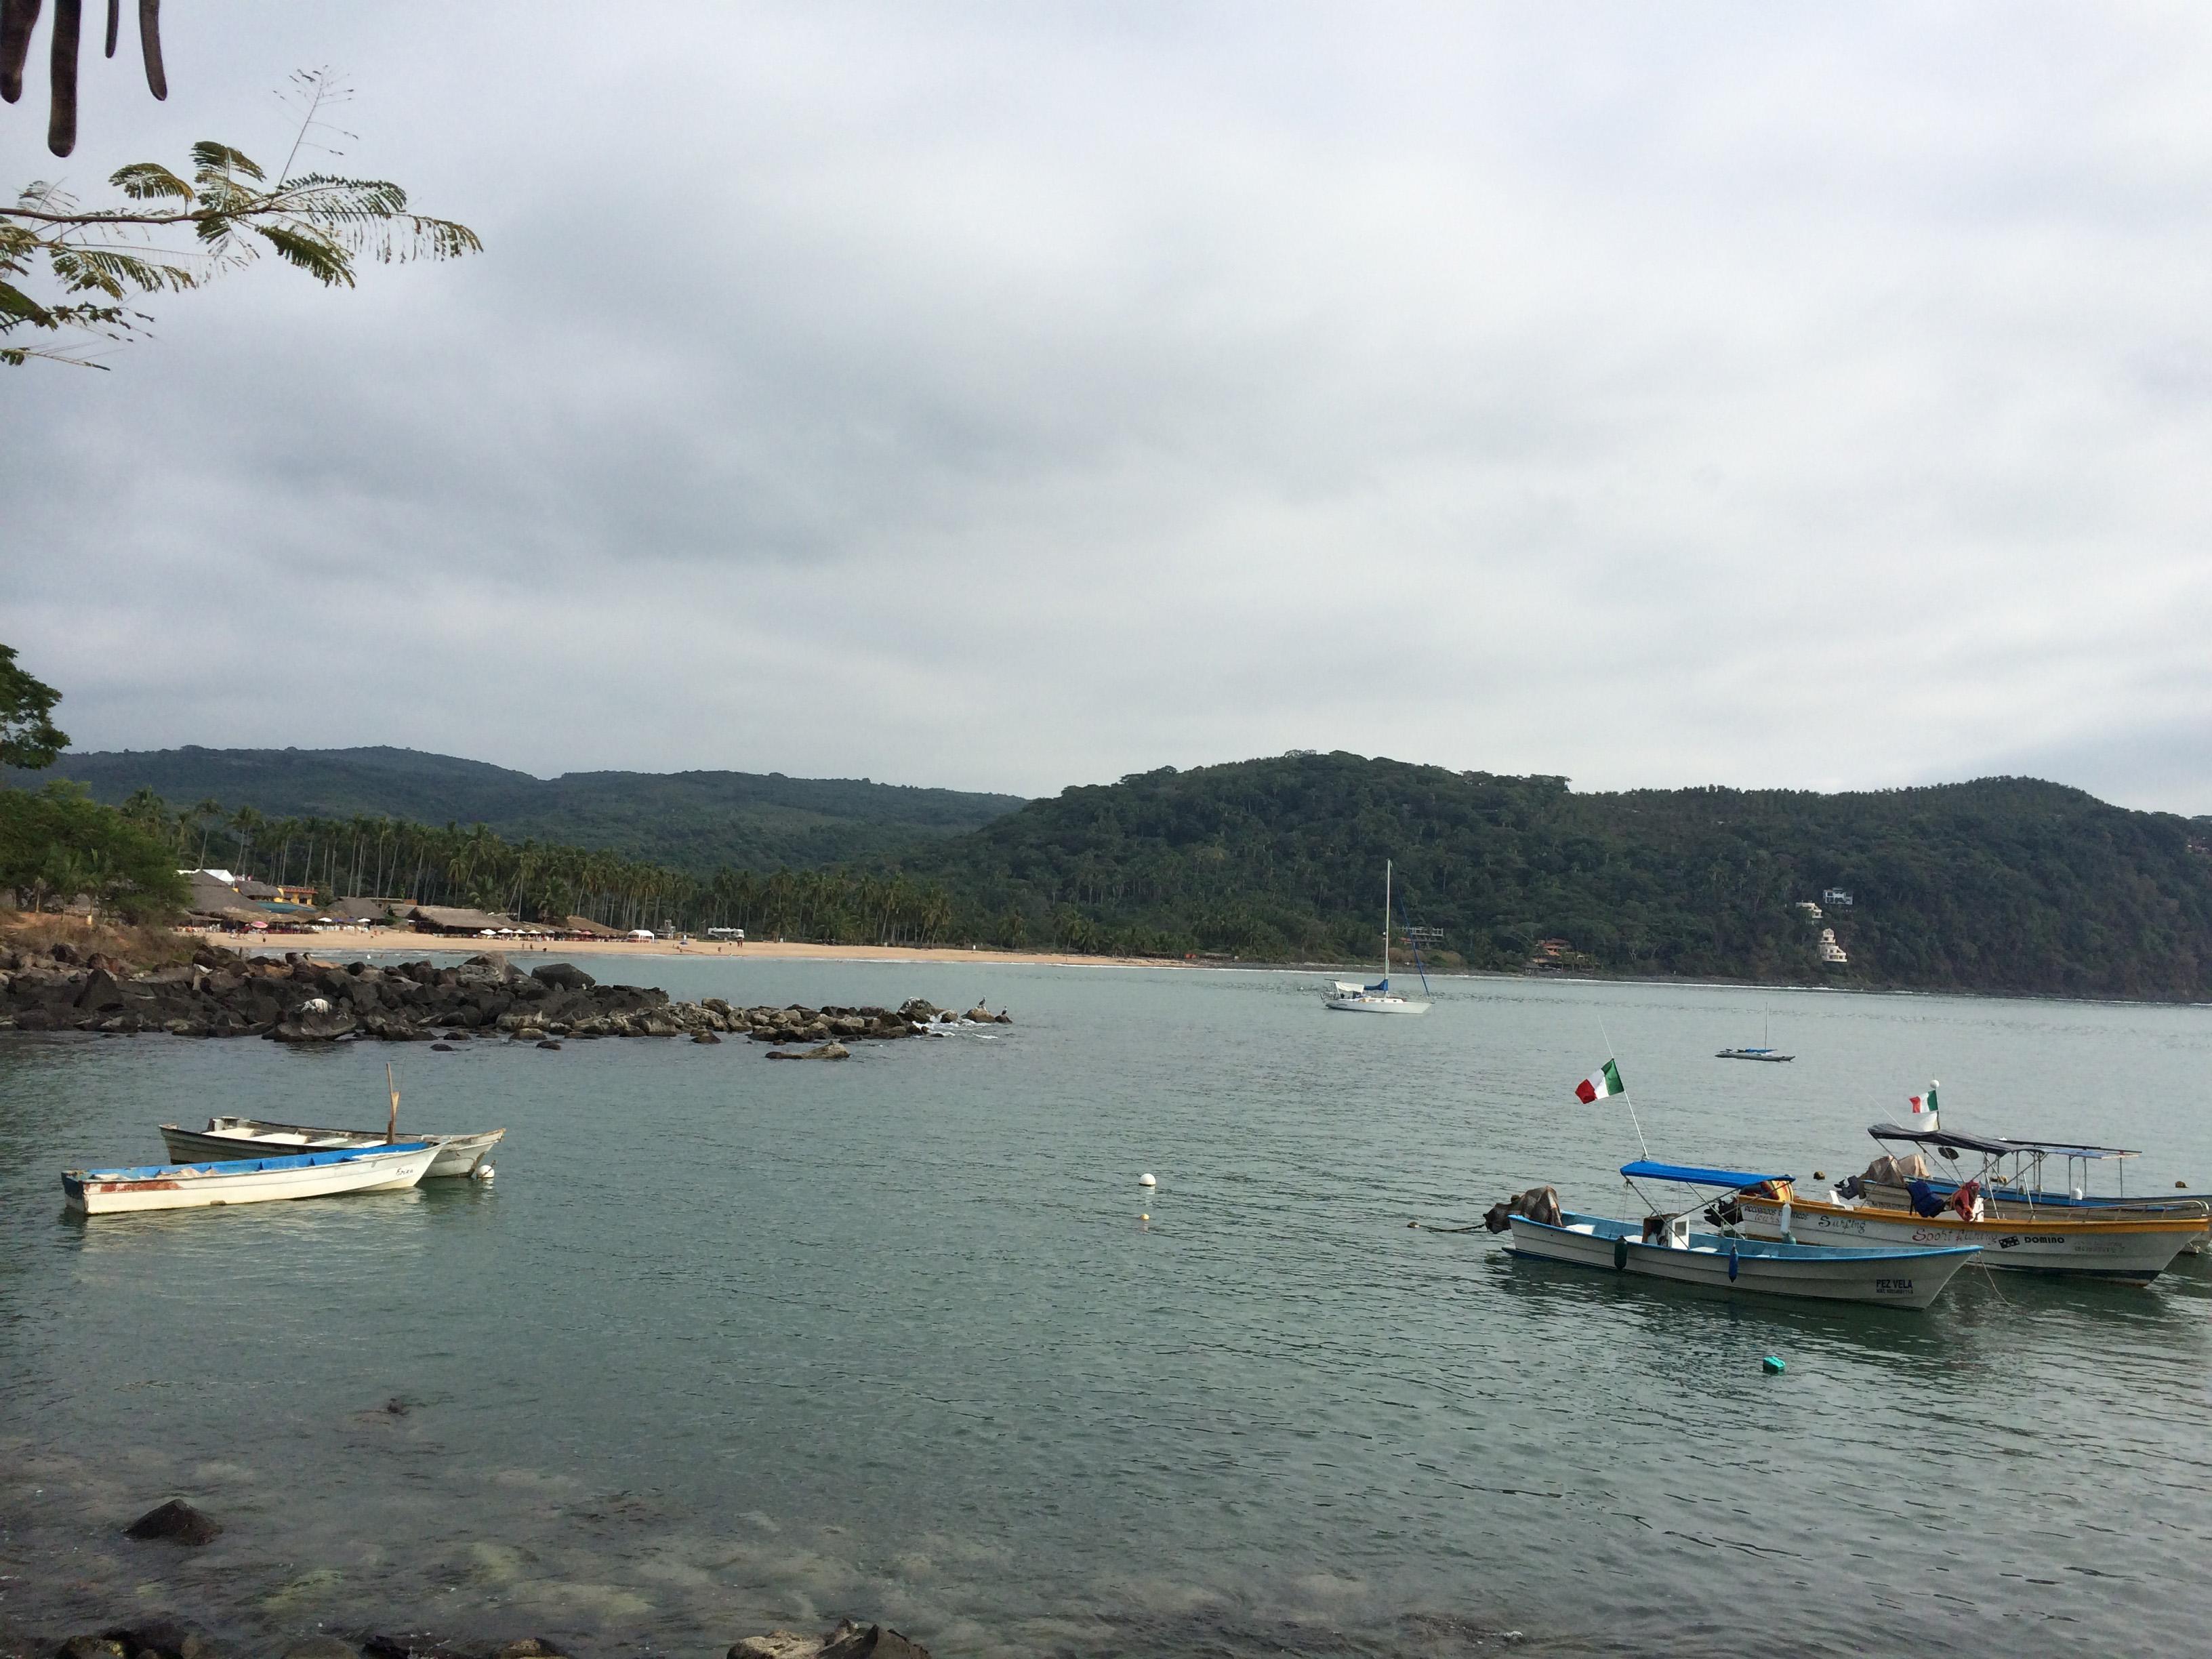 Chac Summer bay